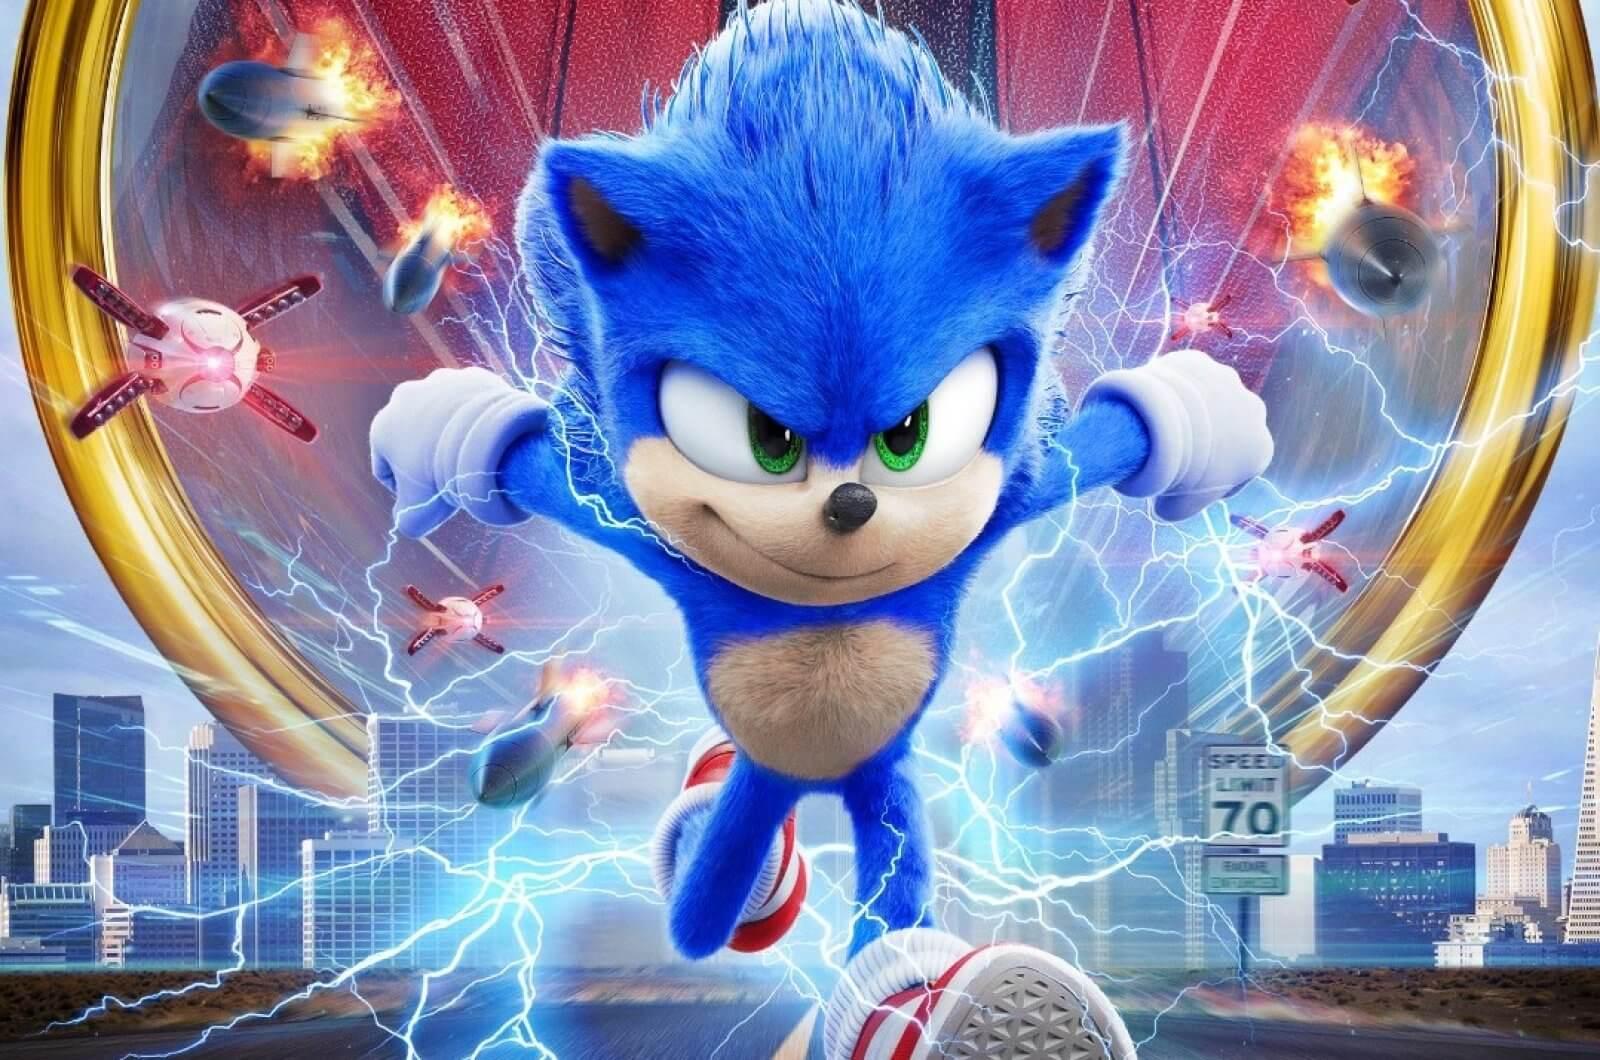 Sonic The Hedgehog 2 Movie Plot Leak Will Impress Retro Gamers